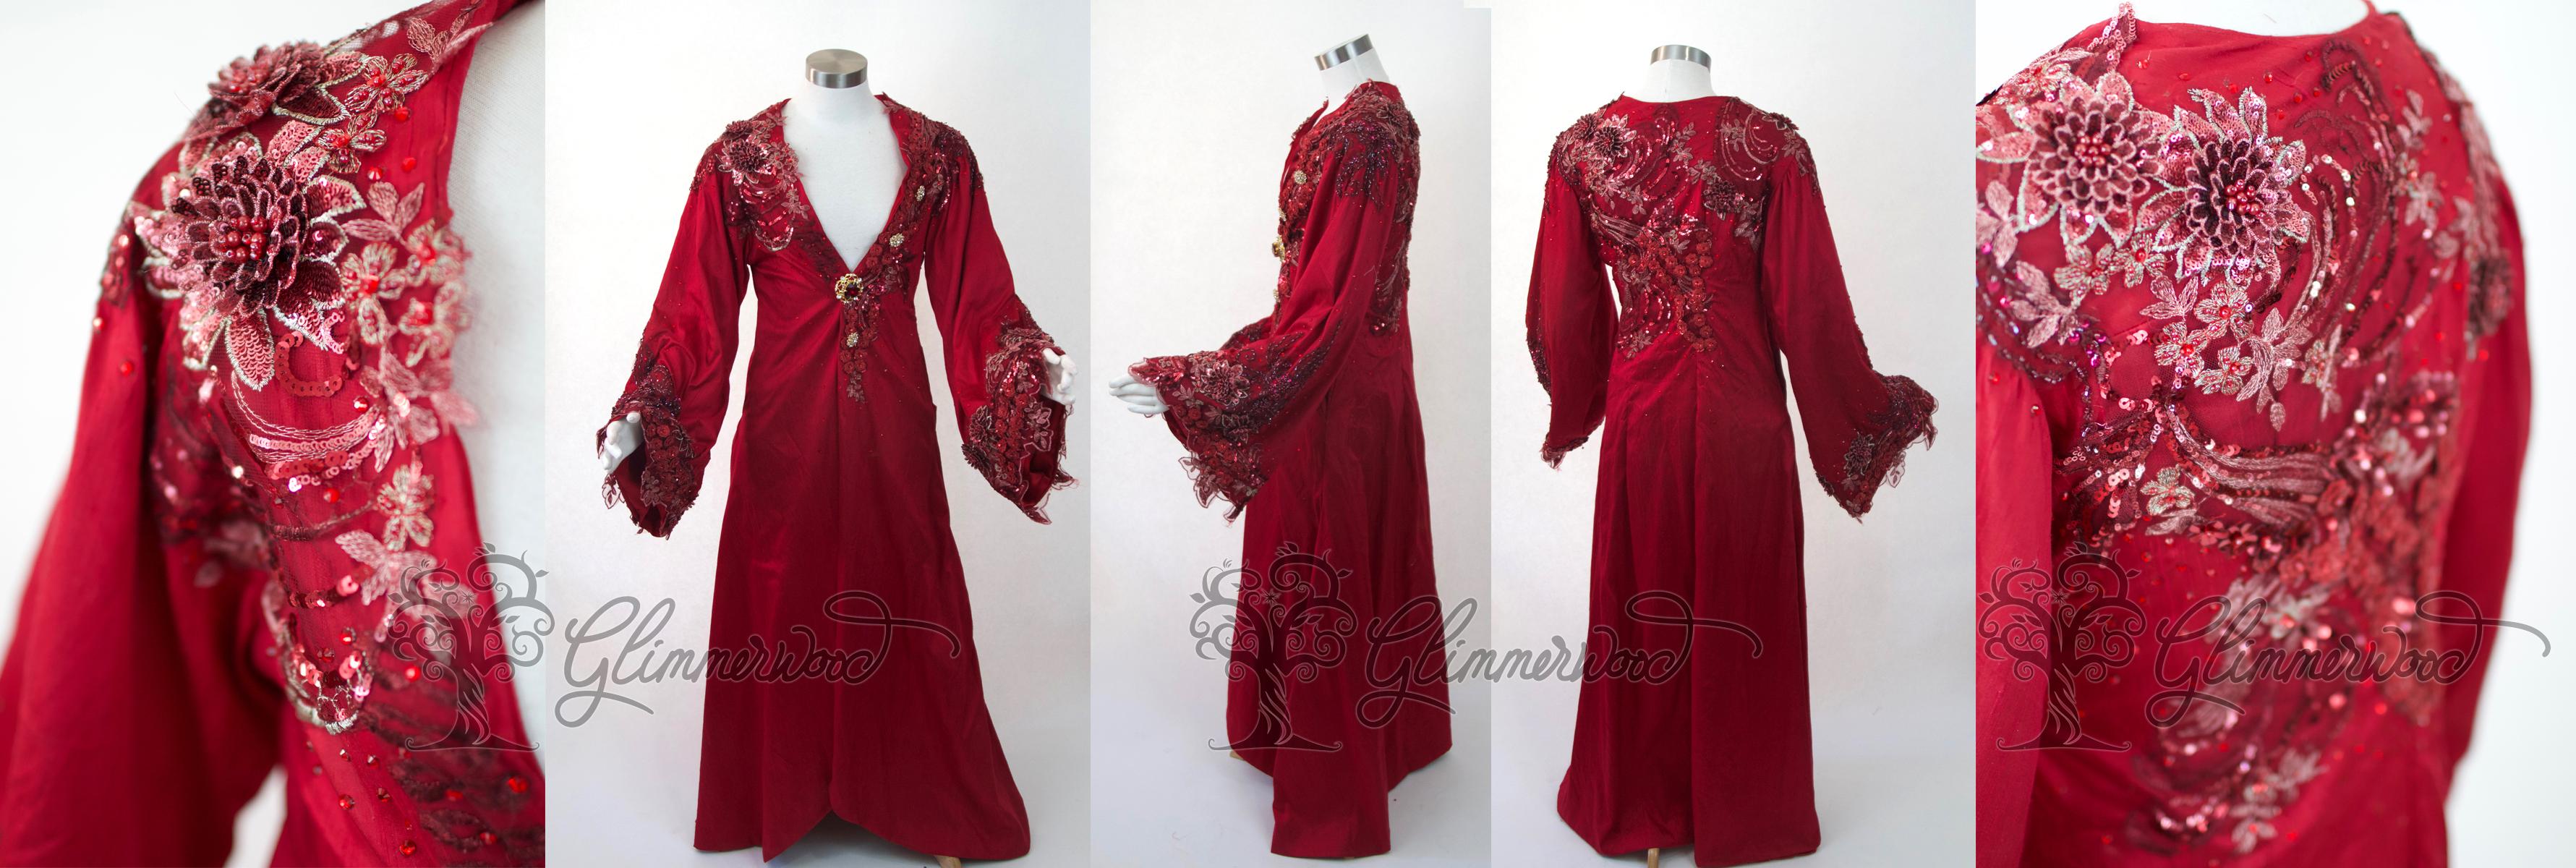 Red Jasmine Robe